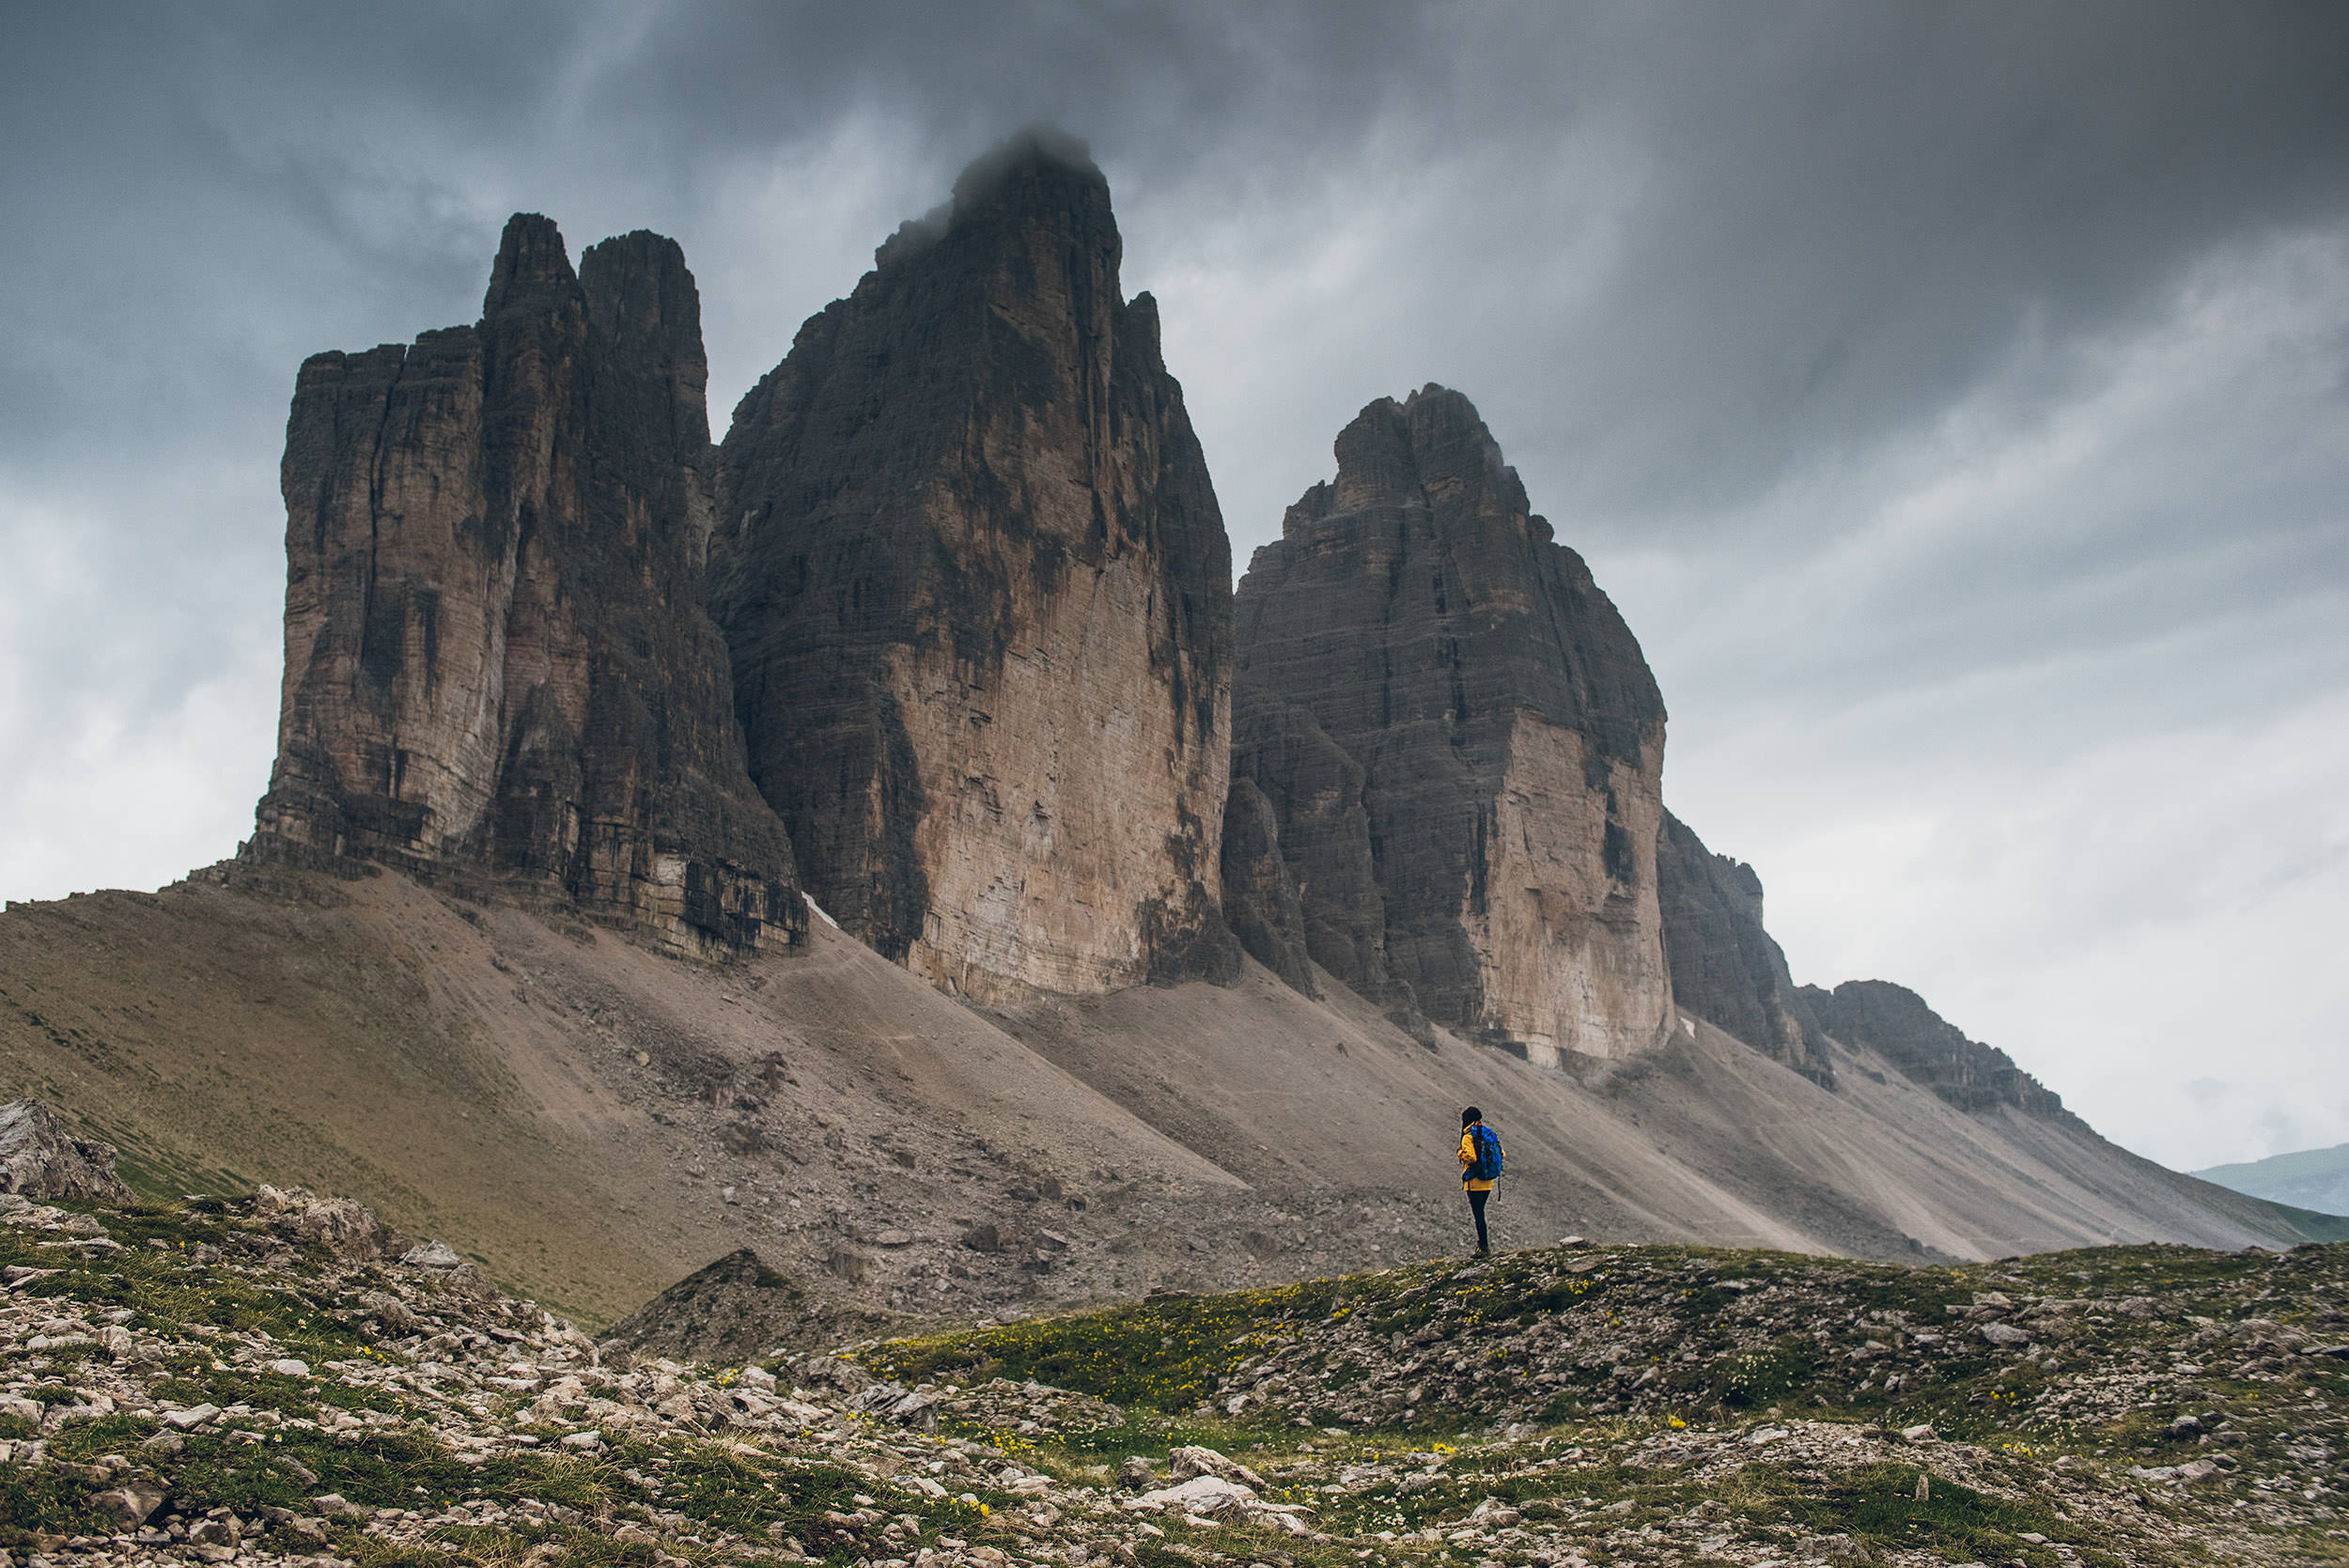 21-outdoor-adventure-mountains-tre-cime-italy-dolomites.jpg